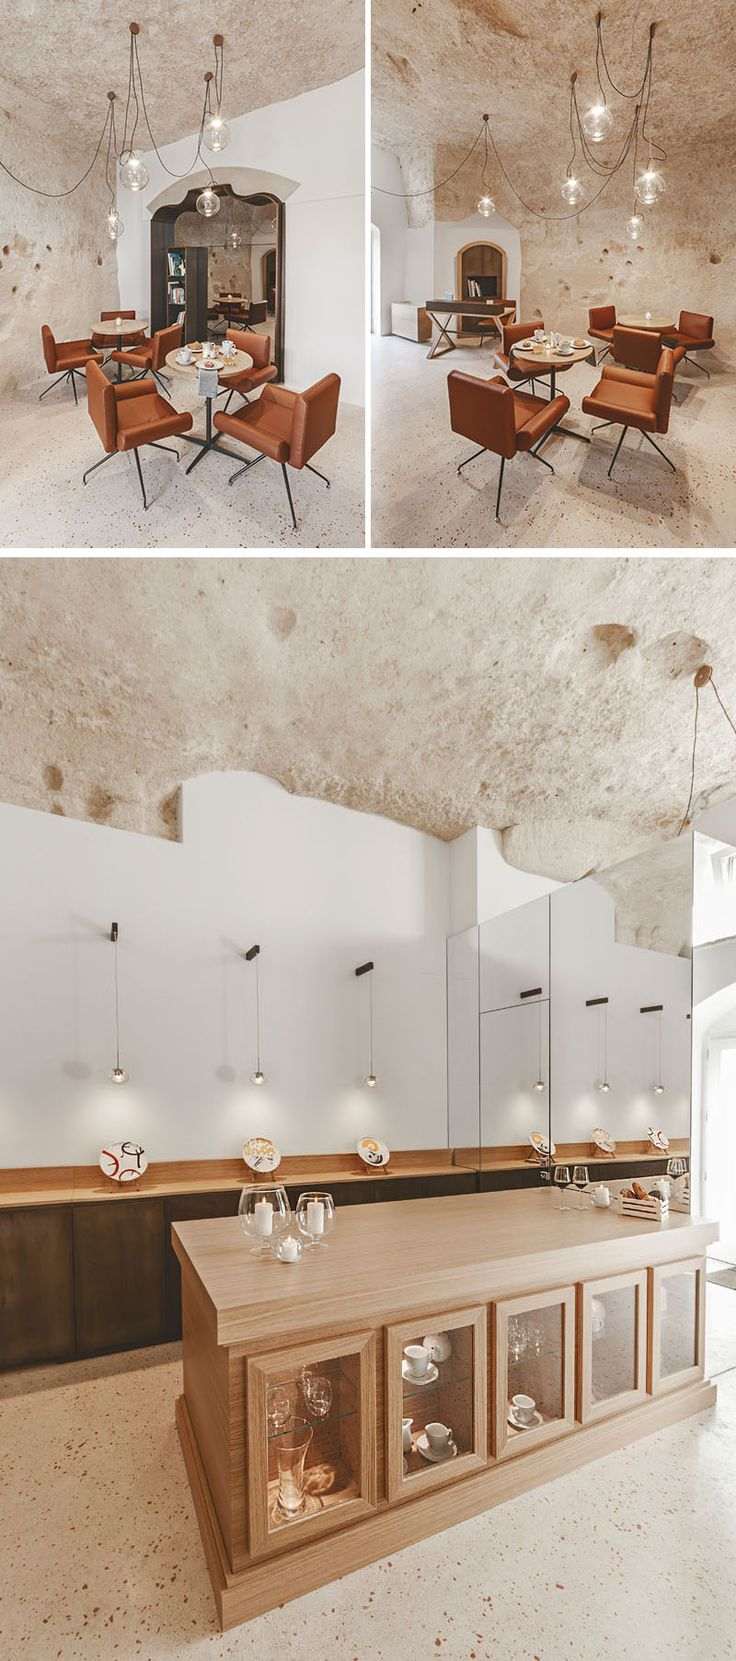 262 best boutique hotel design bycocoon com images on pinterest cocoon boutique hotel inspiration bycocoon com interior design hotel projects bathroom design